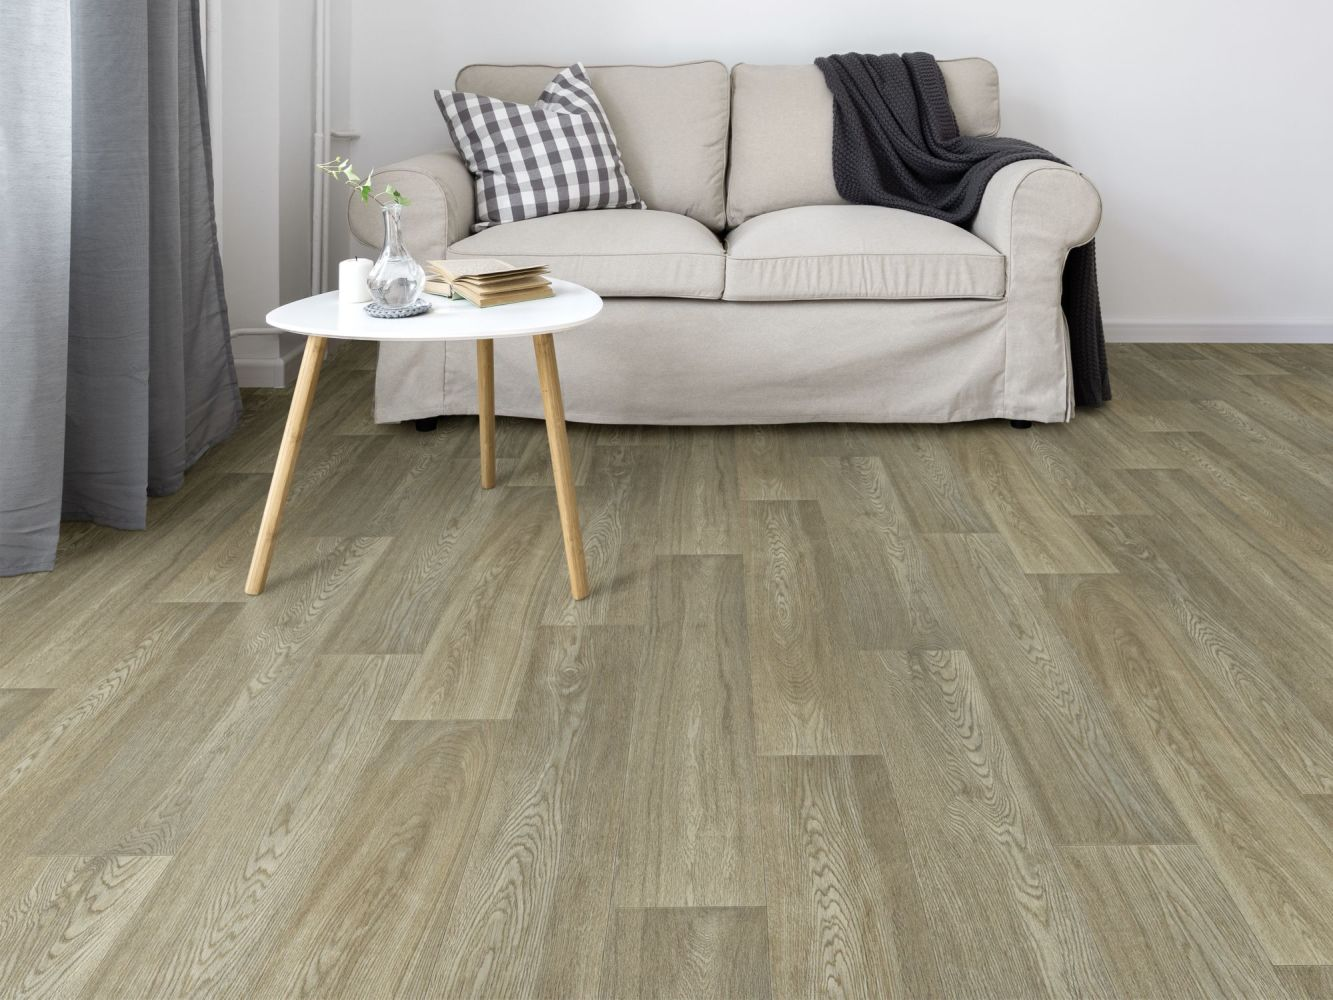 Shaw Floors Resilient Residential Urban Woodlands 65g Barnes 00254_VG088